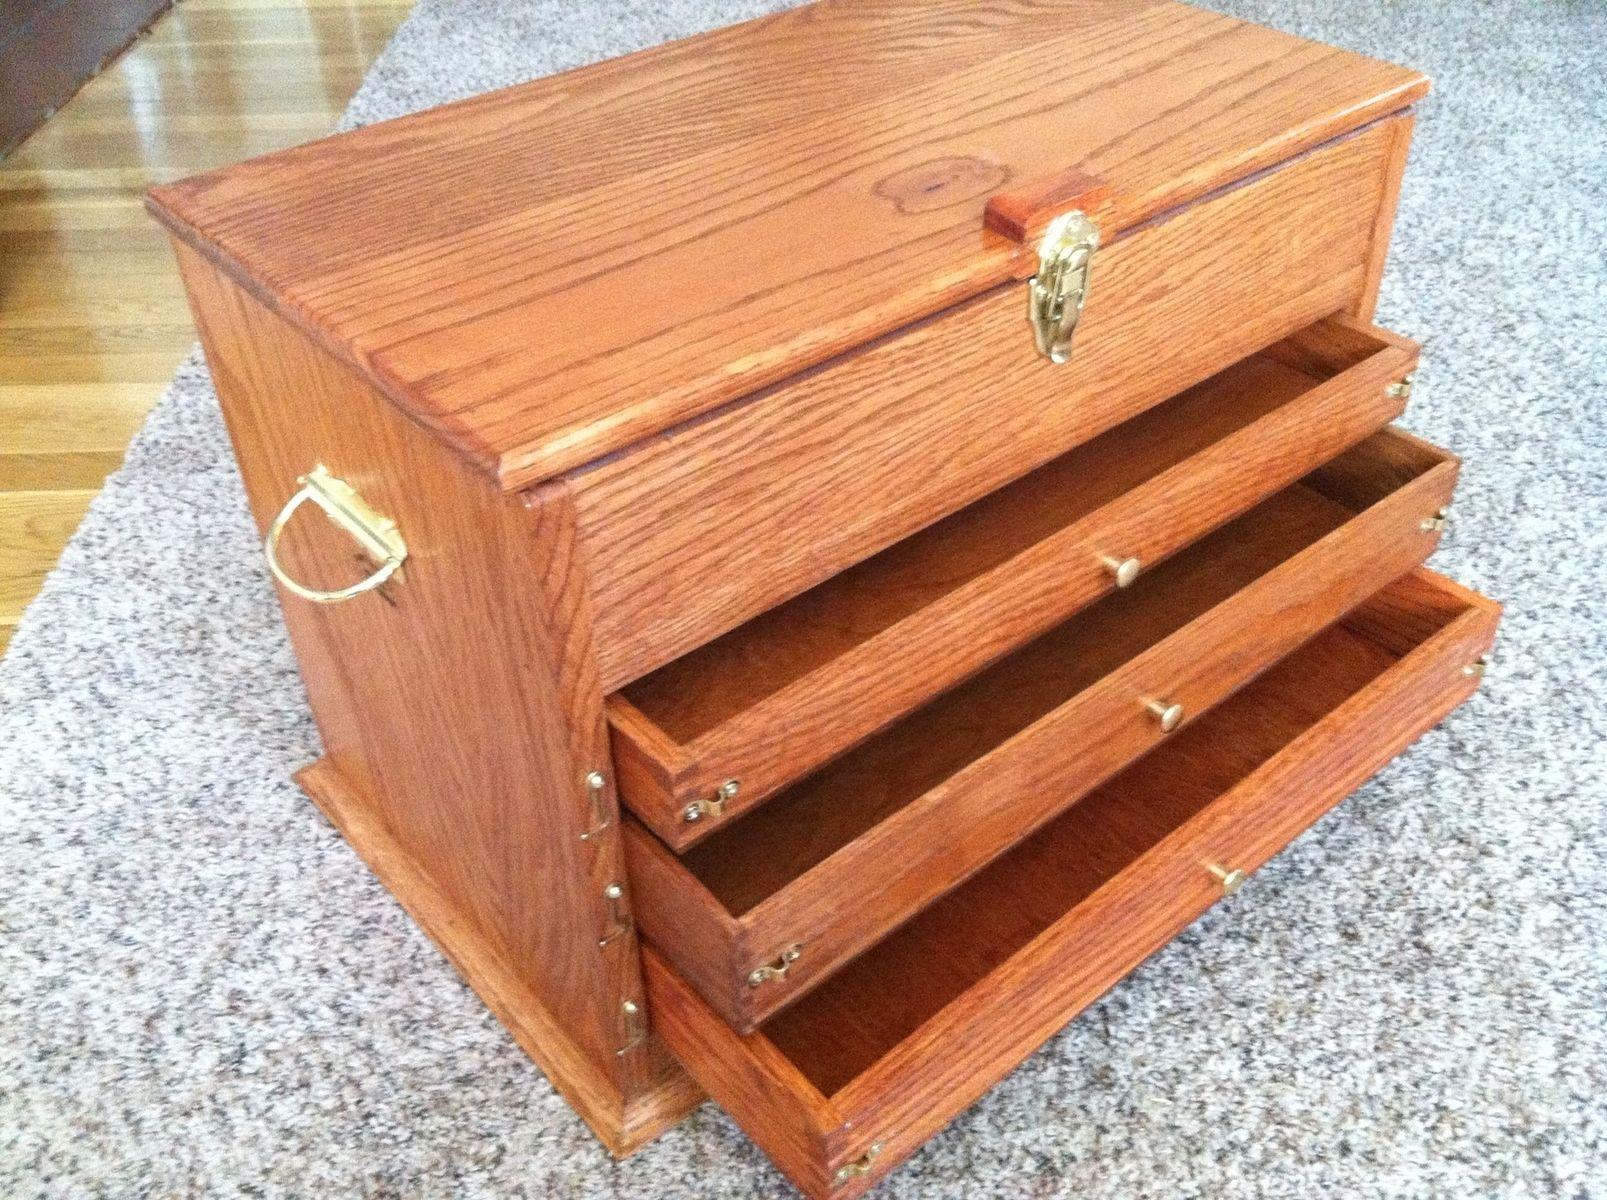 Custom Tool Box By Phoenix Woodworking CustomMadecom